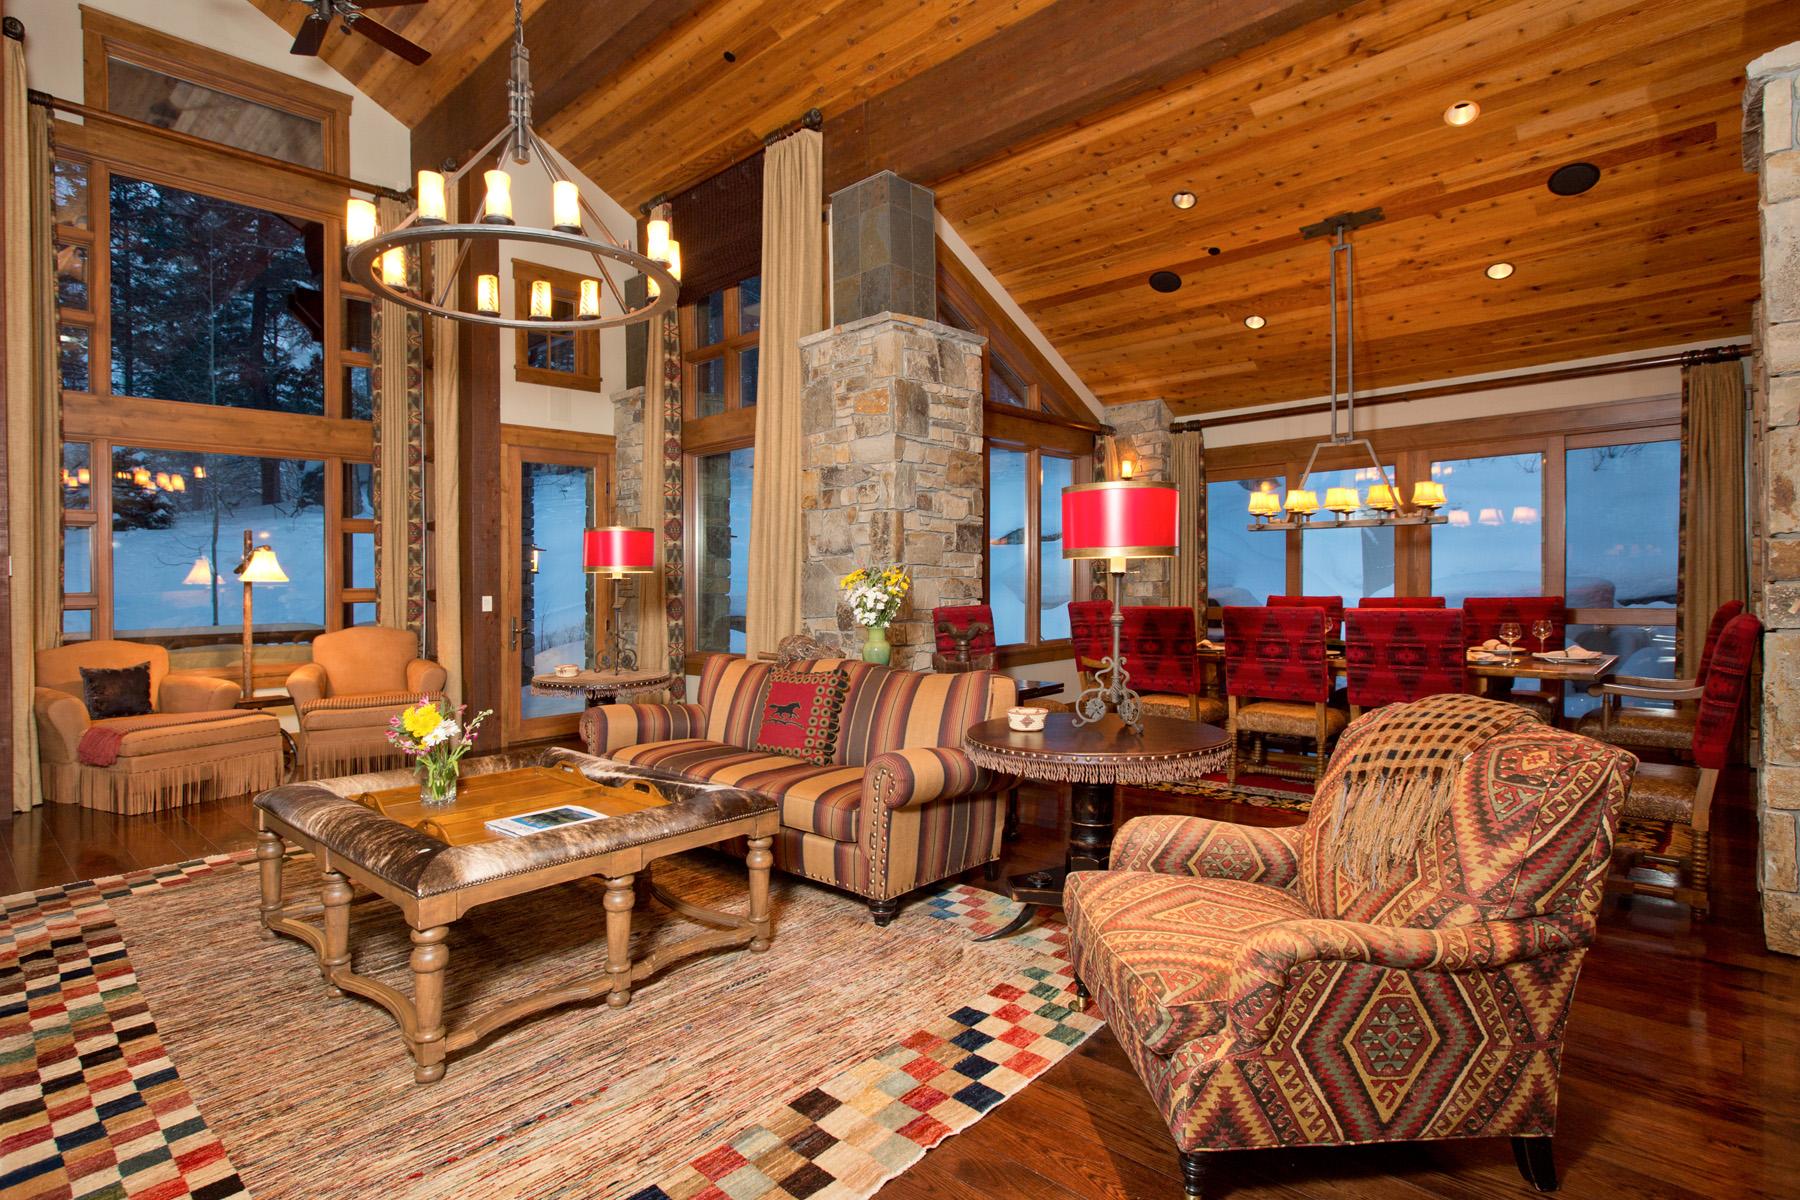 Property For Sale at Ski-In Ski-Out Home in Teton Village